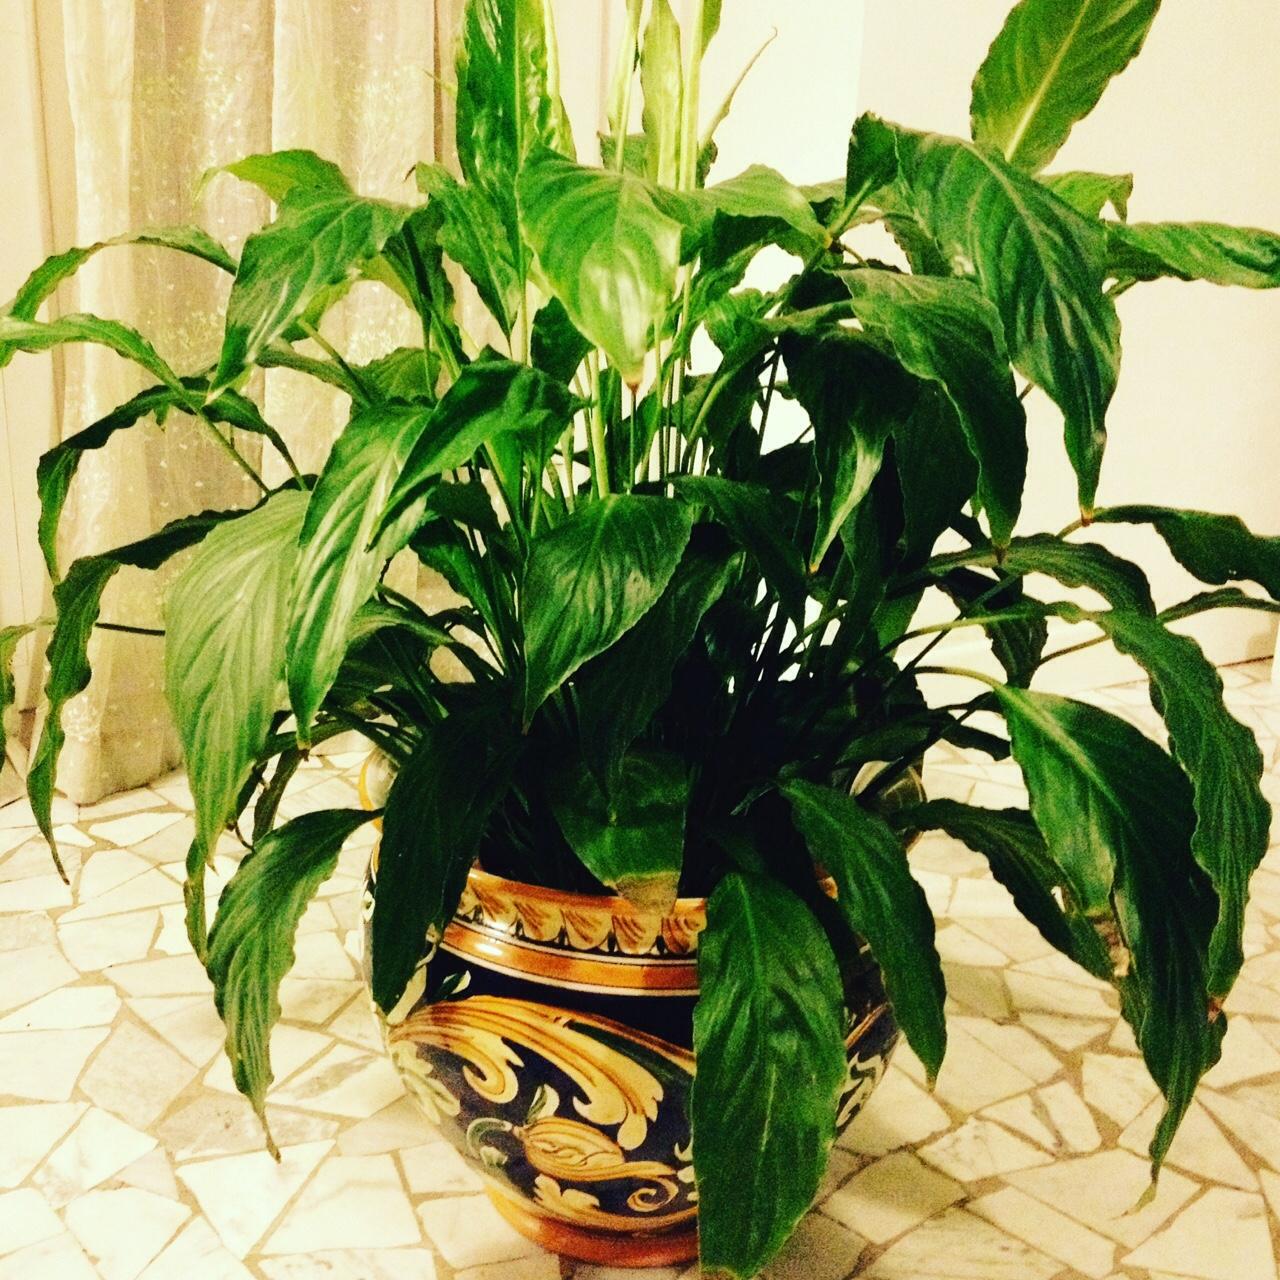 Spatifillo eleganza senza pretese oltreilbalcone for Spatifillo pianta